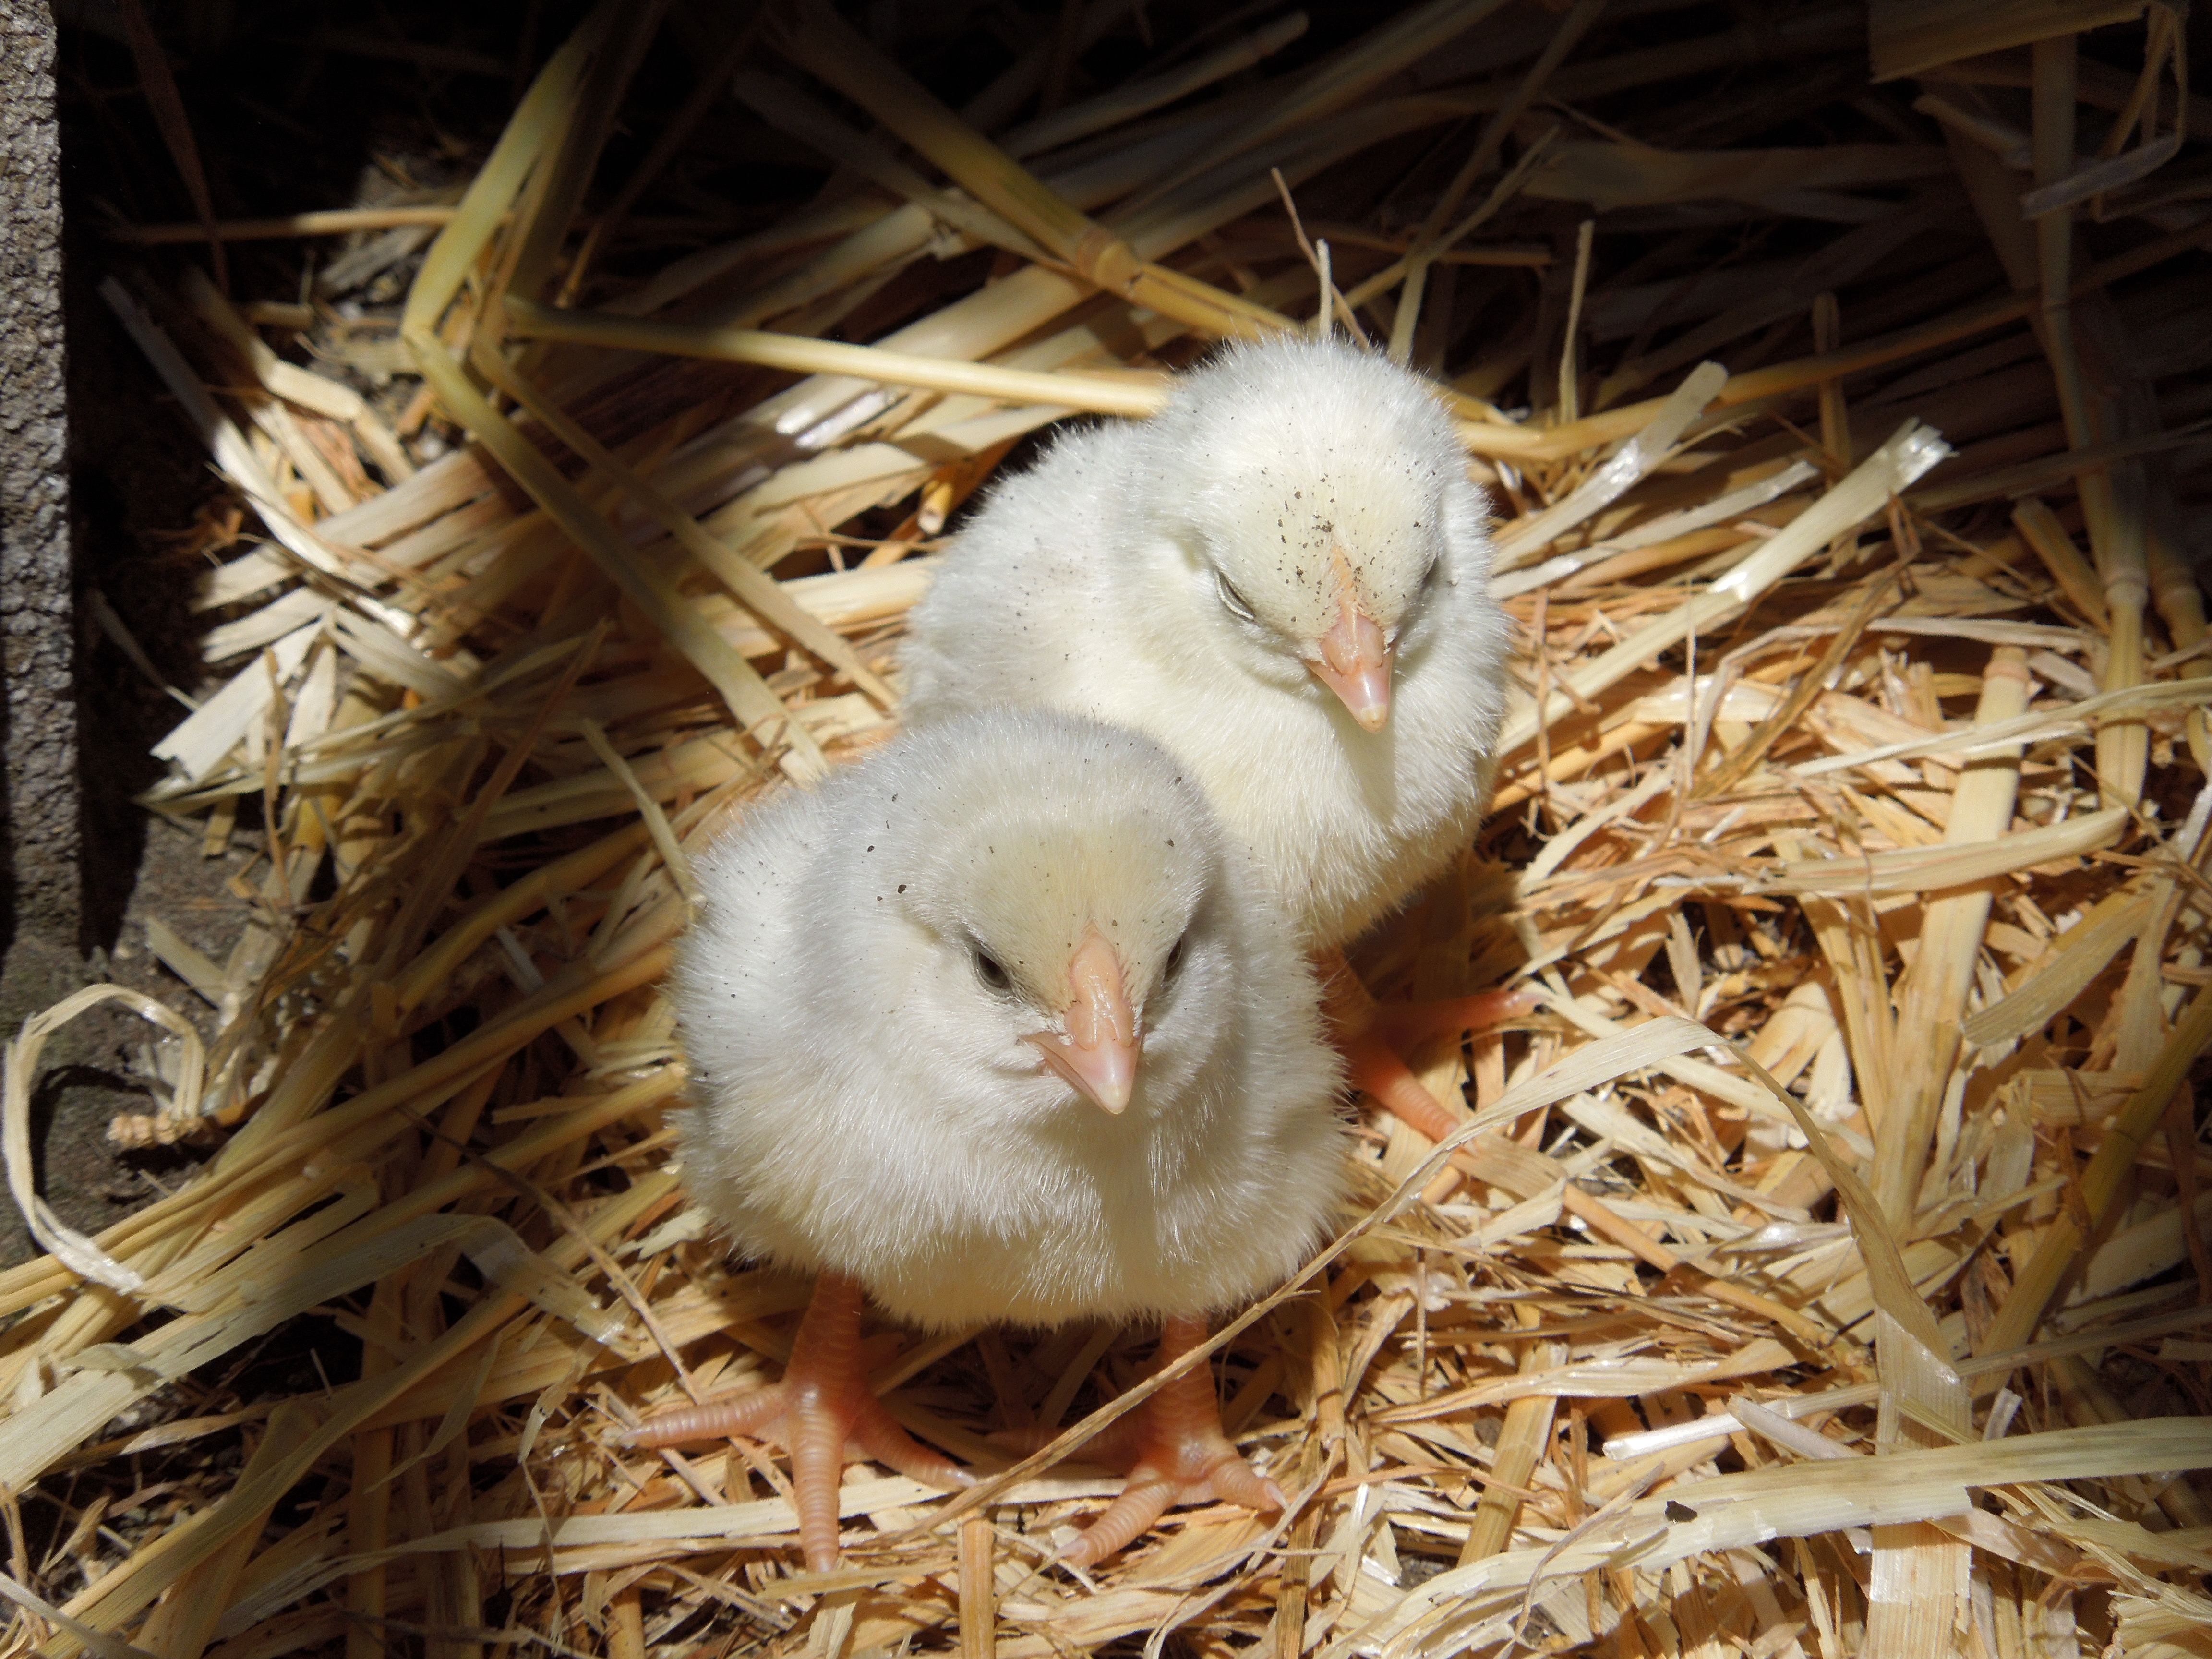 Pulcini di gallina padovana